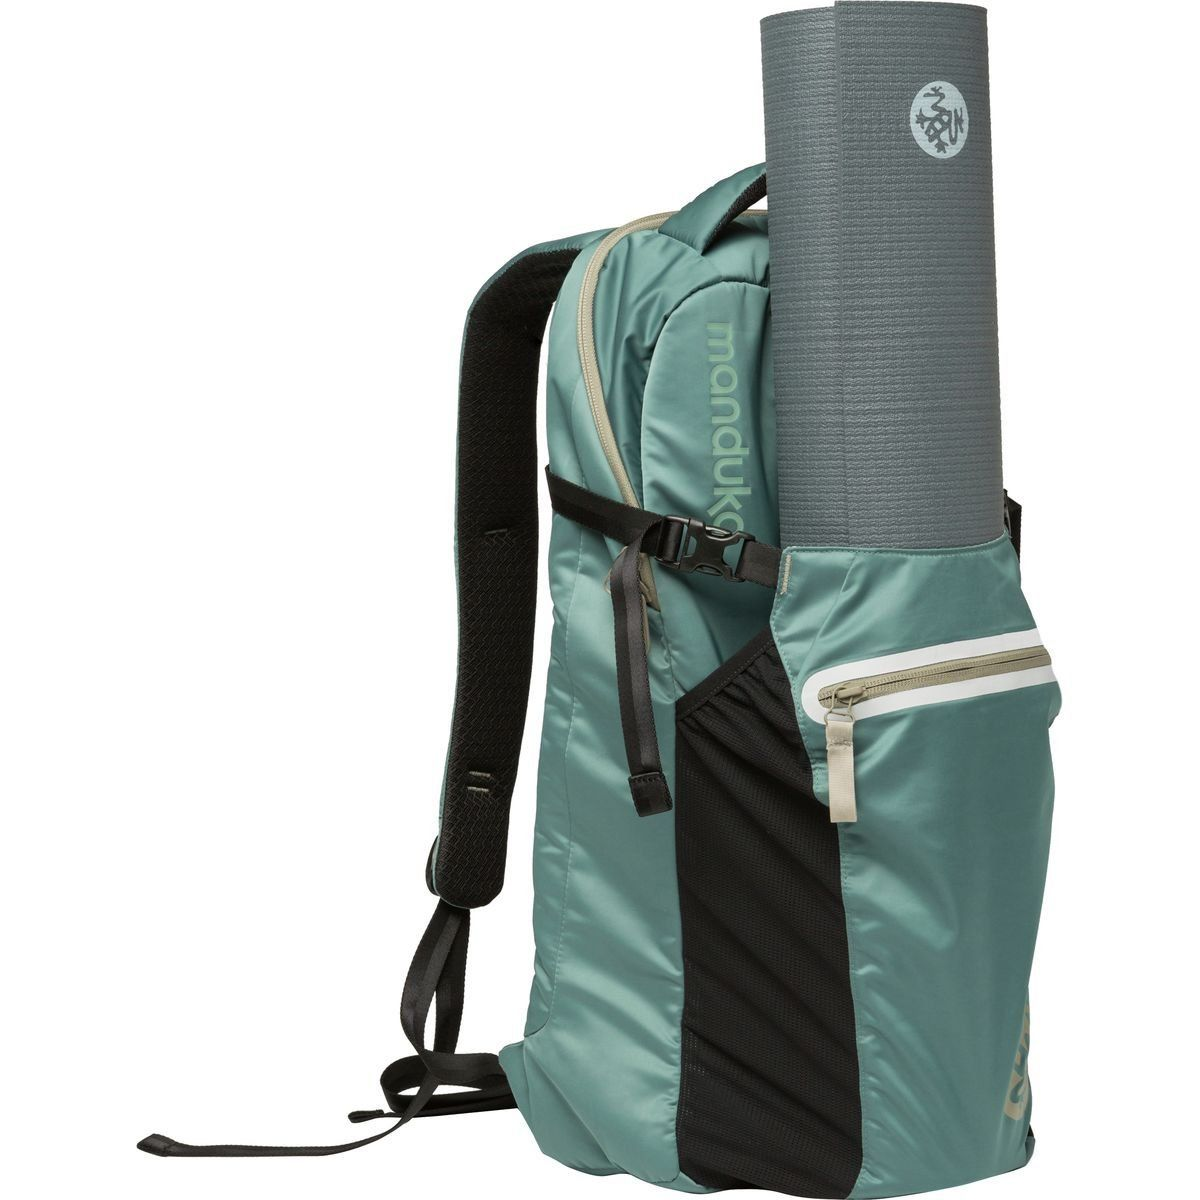 Manduka Go Free Yoga Mat Backpack Click On The Image For Additional Details Yoga Bag Yoga Mats Best Yoga Gym Bag